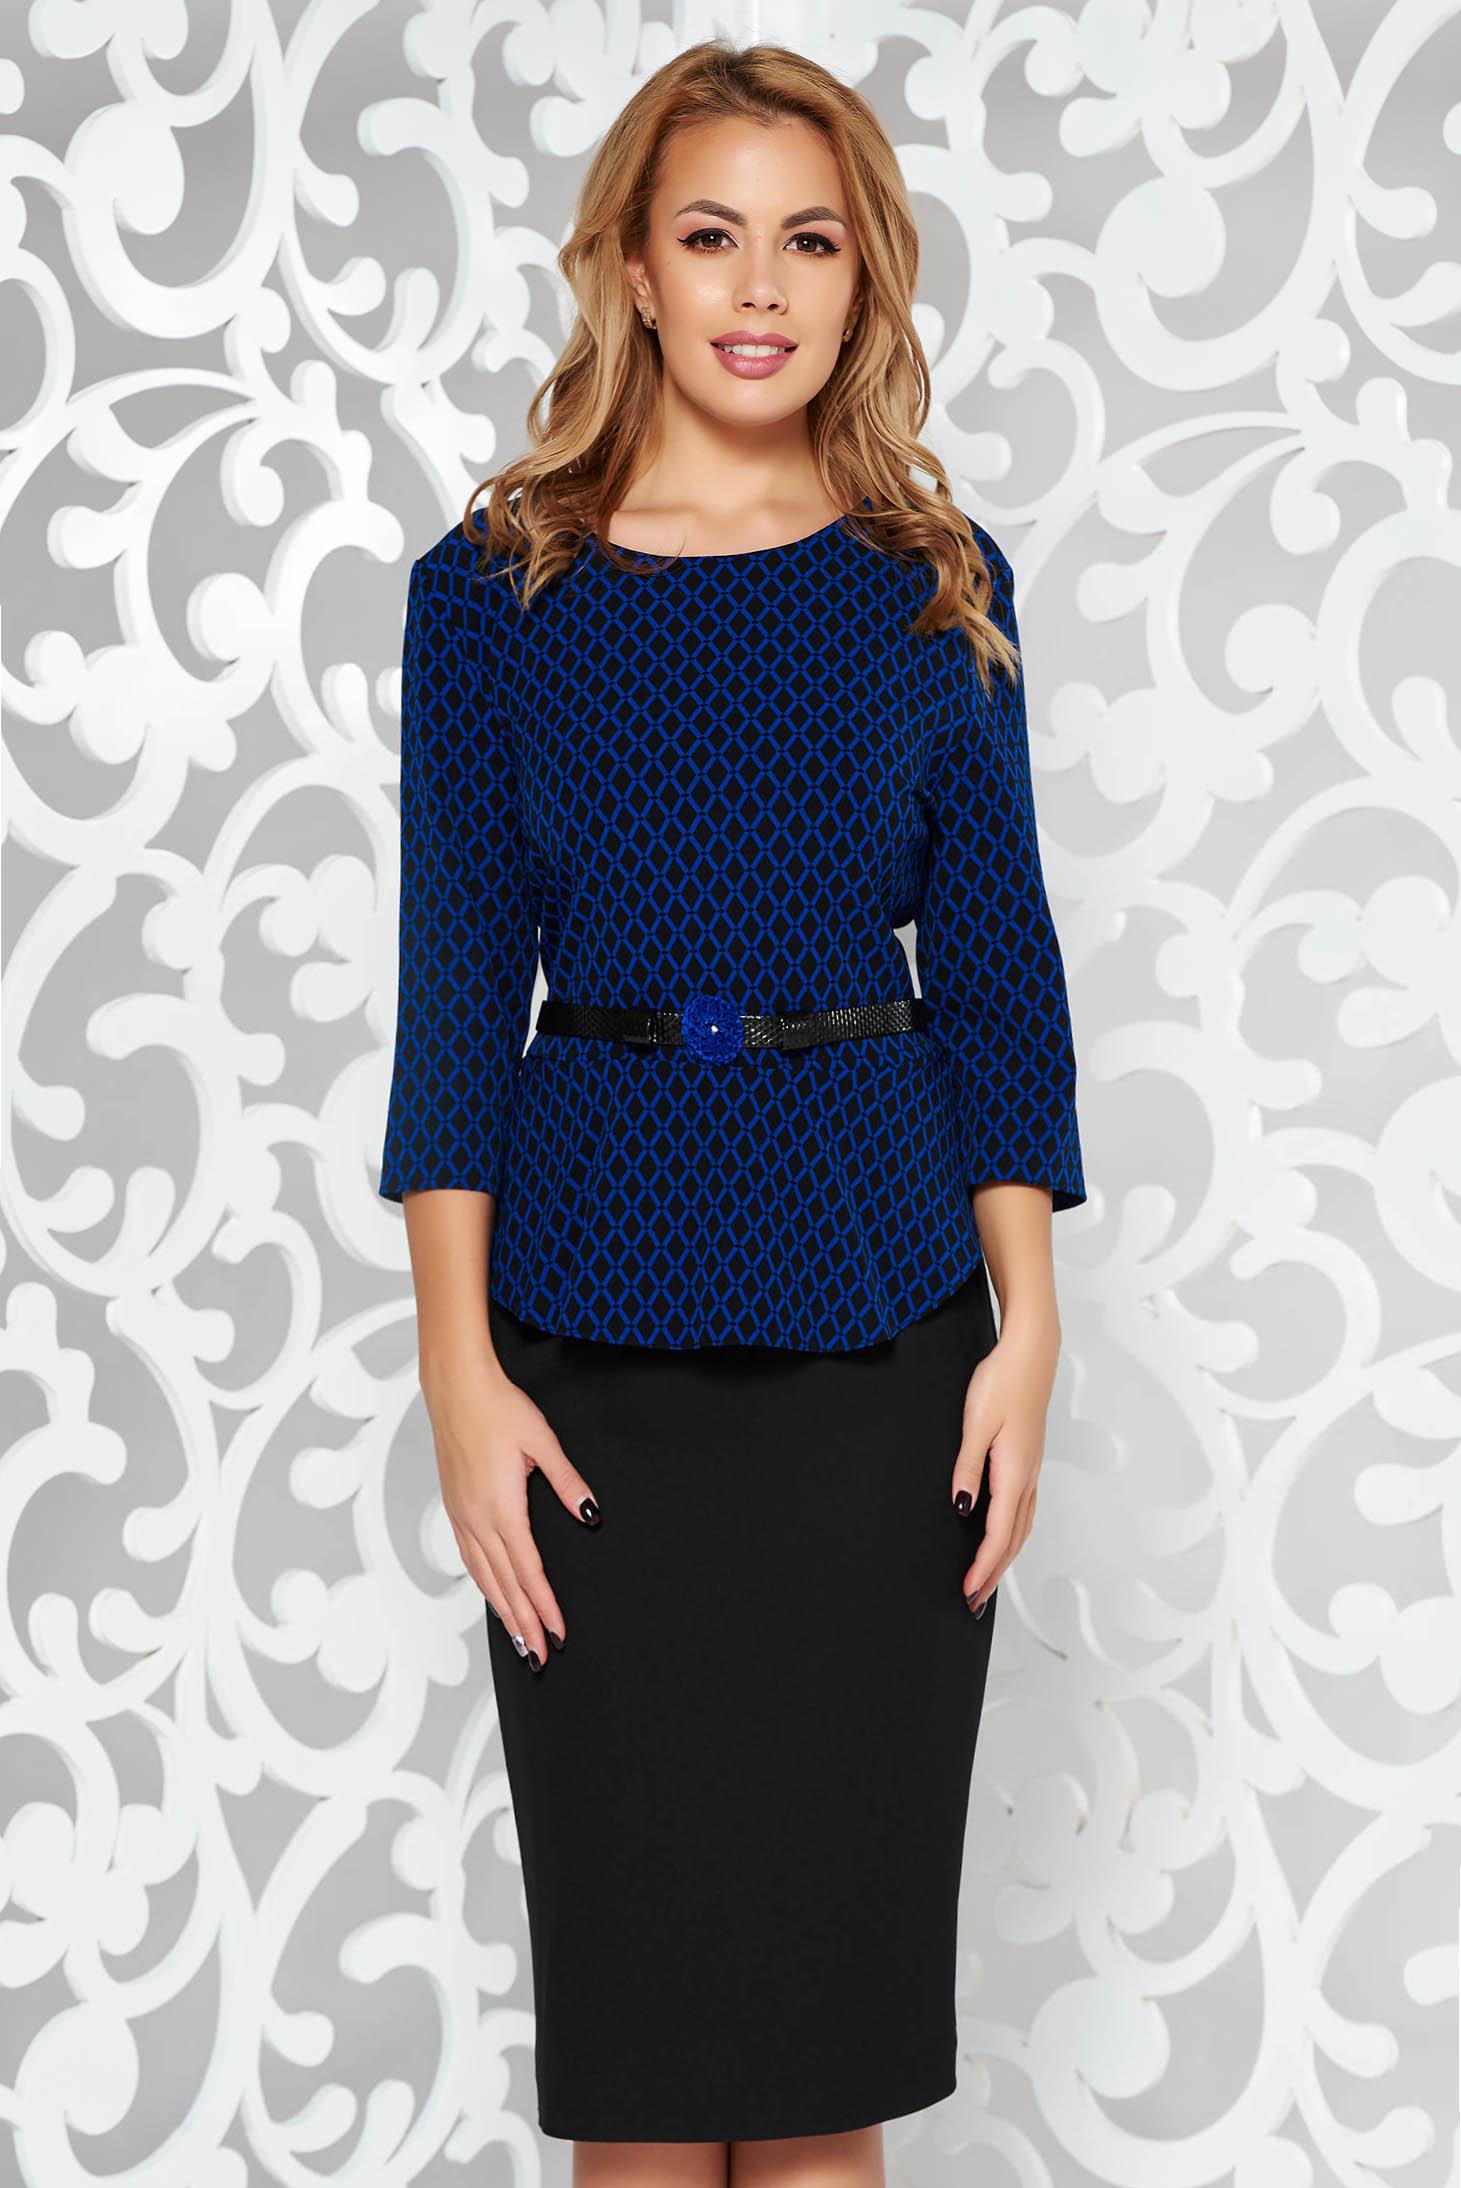 Rochie albastra-inchis eleganta tip creion cu peplum din stofa usor elastica accesorizata cu cordon